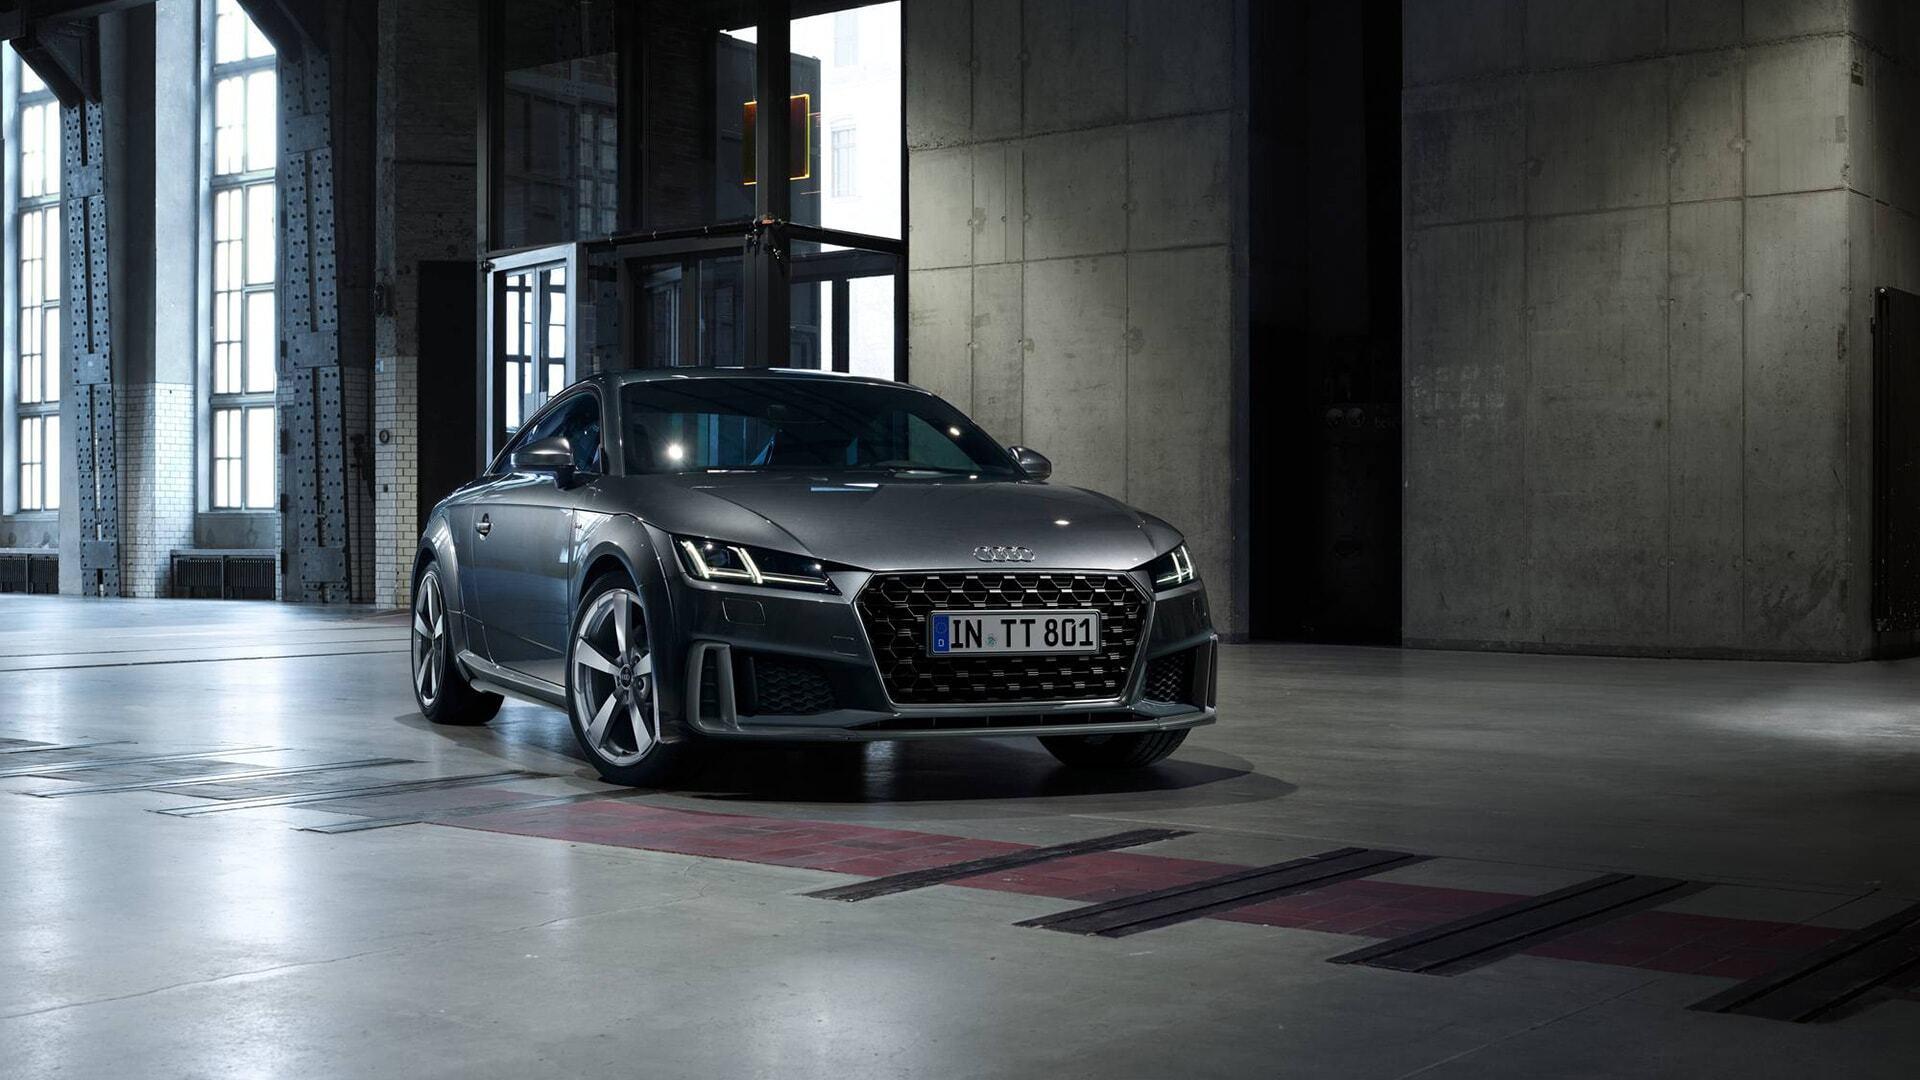 Audi Tt 2020 1366x768 Wallpaper Teahub Io